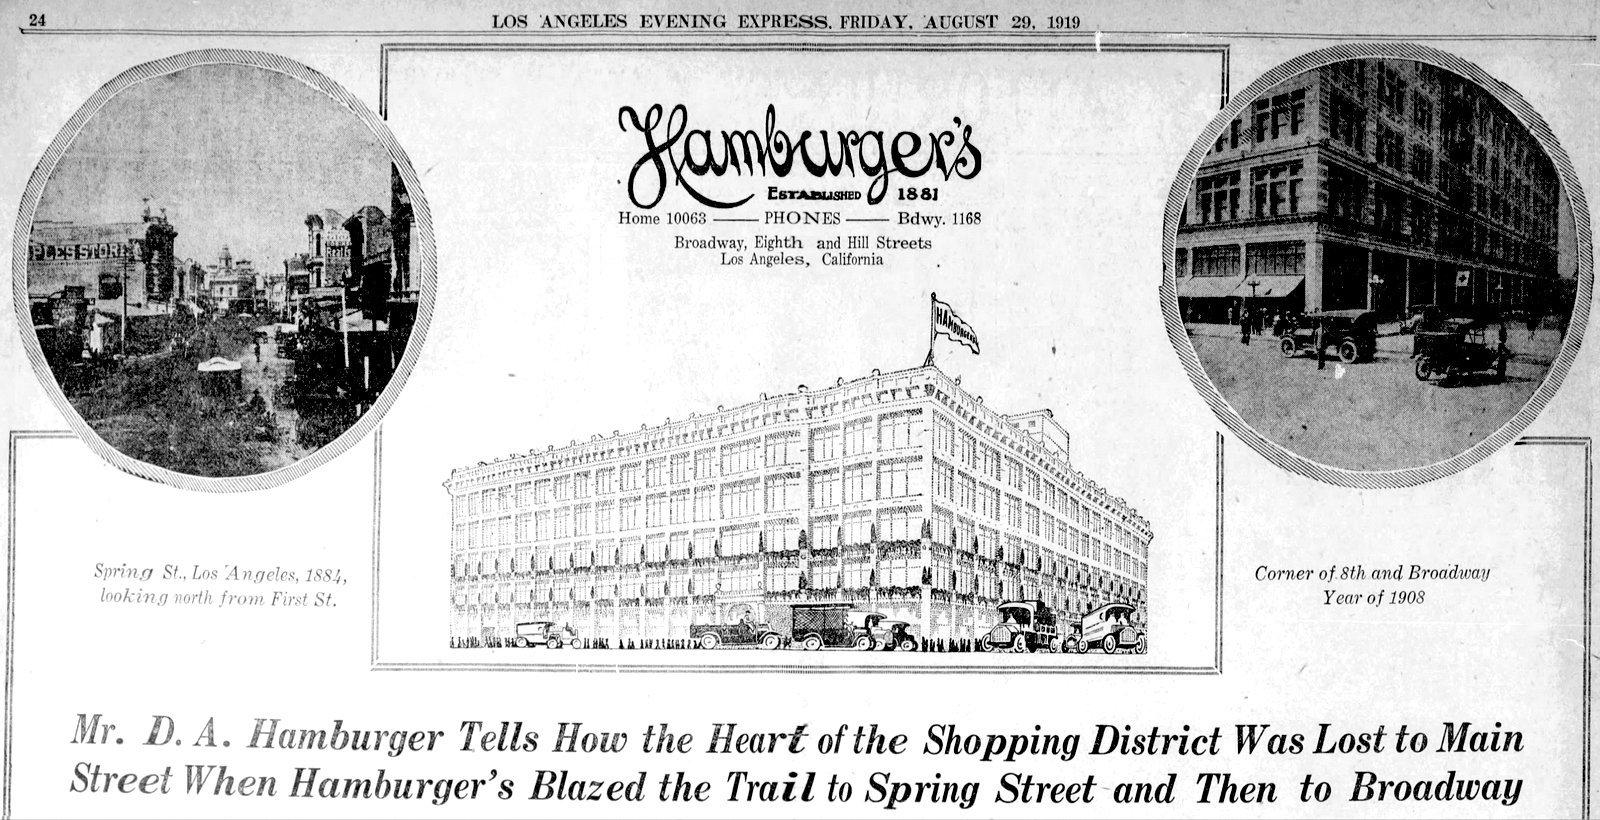 Hamburger Department Store - Los Angeles (1919)